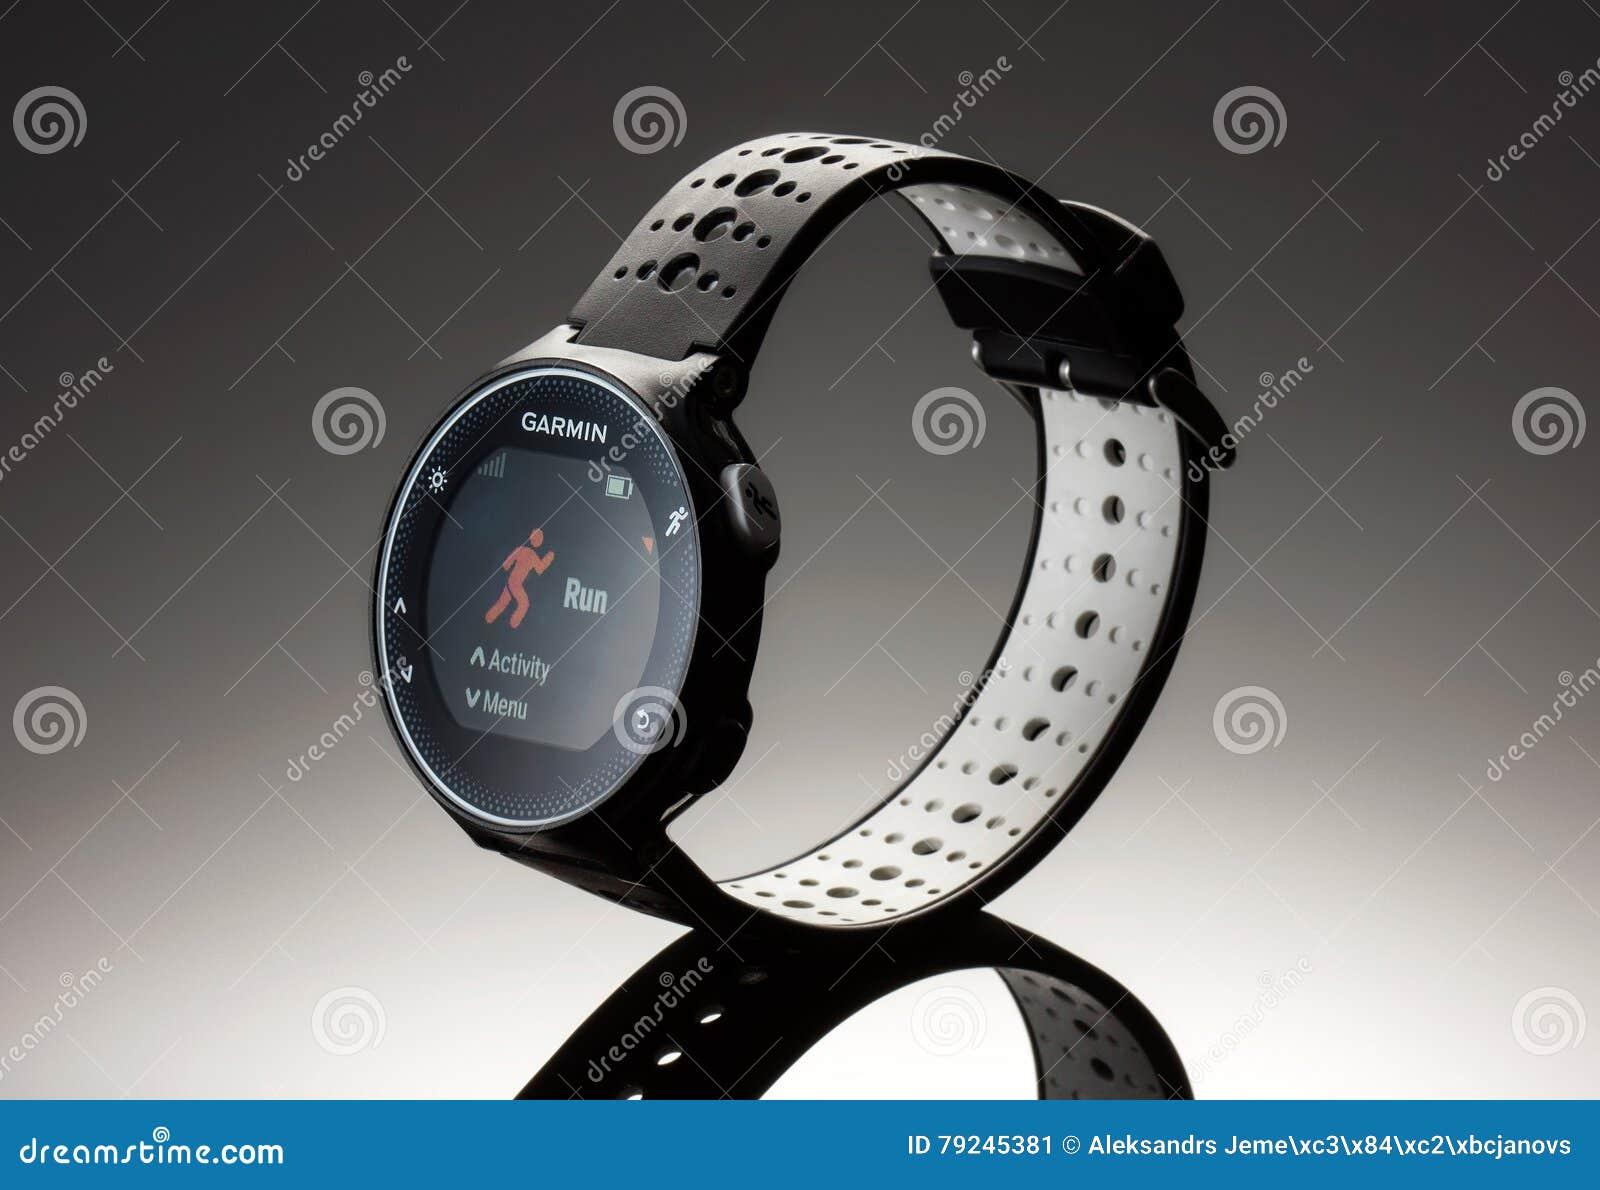 Fitness garmin 230 watch 2016 on dark background editorial photo fitness garmin 230 watch 2016 on dark background editorial stock photo buycottarizona Gallery